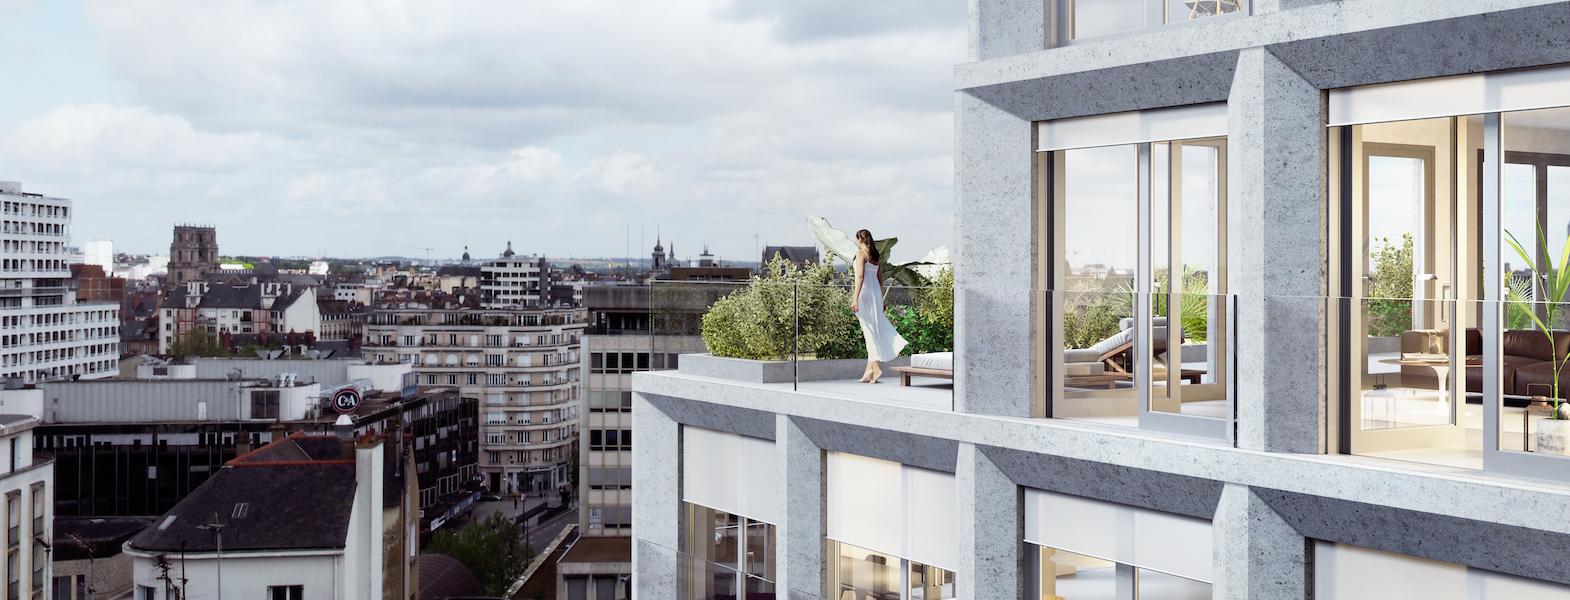 Beaumont_EuroRennes_vue_terrasse_tour_logements_credit_Sugar_Visuals.jpg